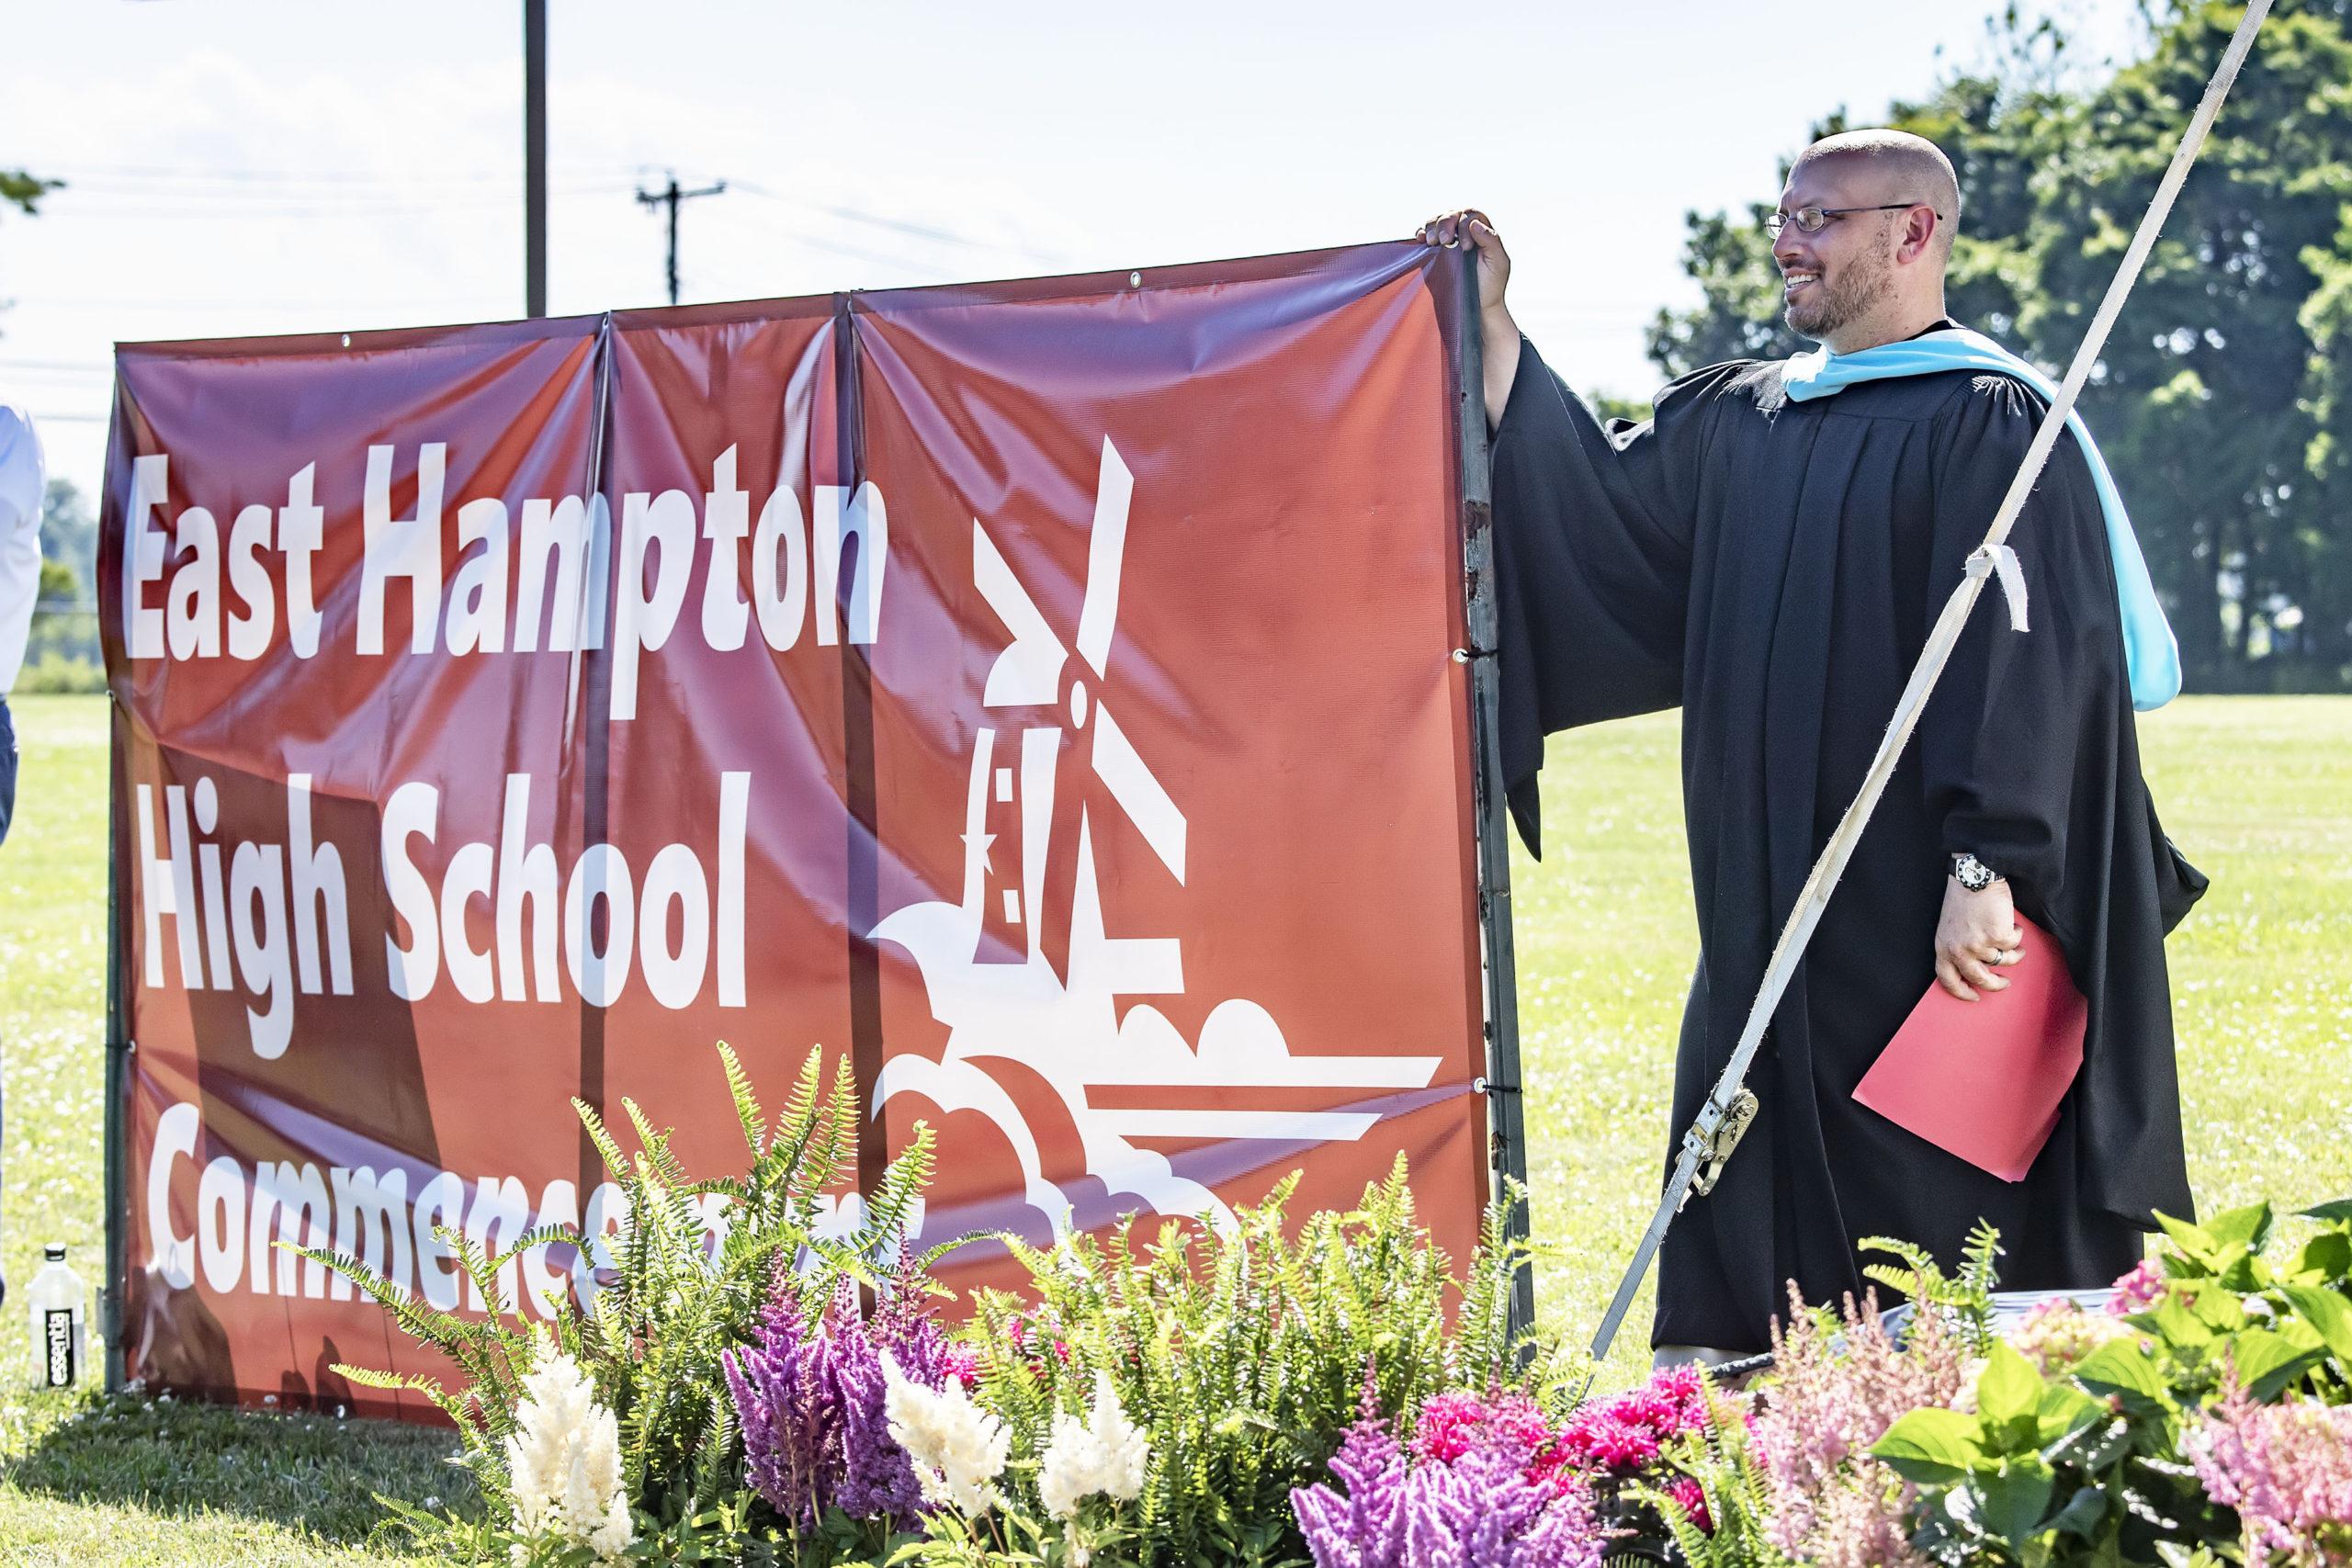 East Hampton High School Principal Adam Fine during the 2020 graduation ceremony at the East Hampton High School on Friday.